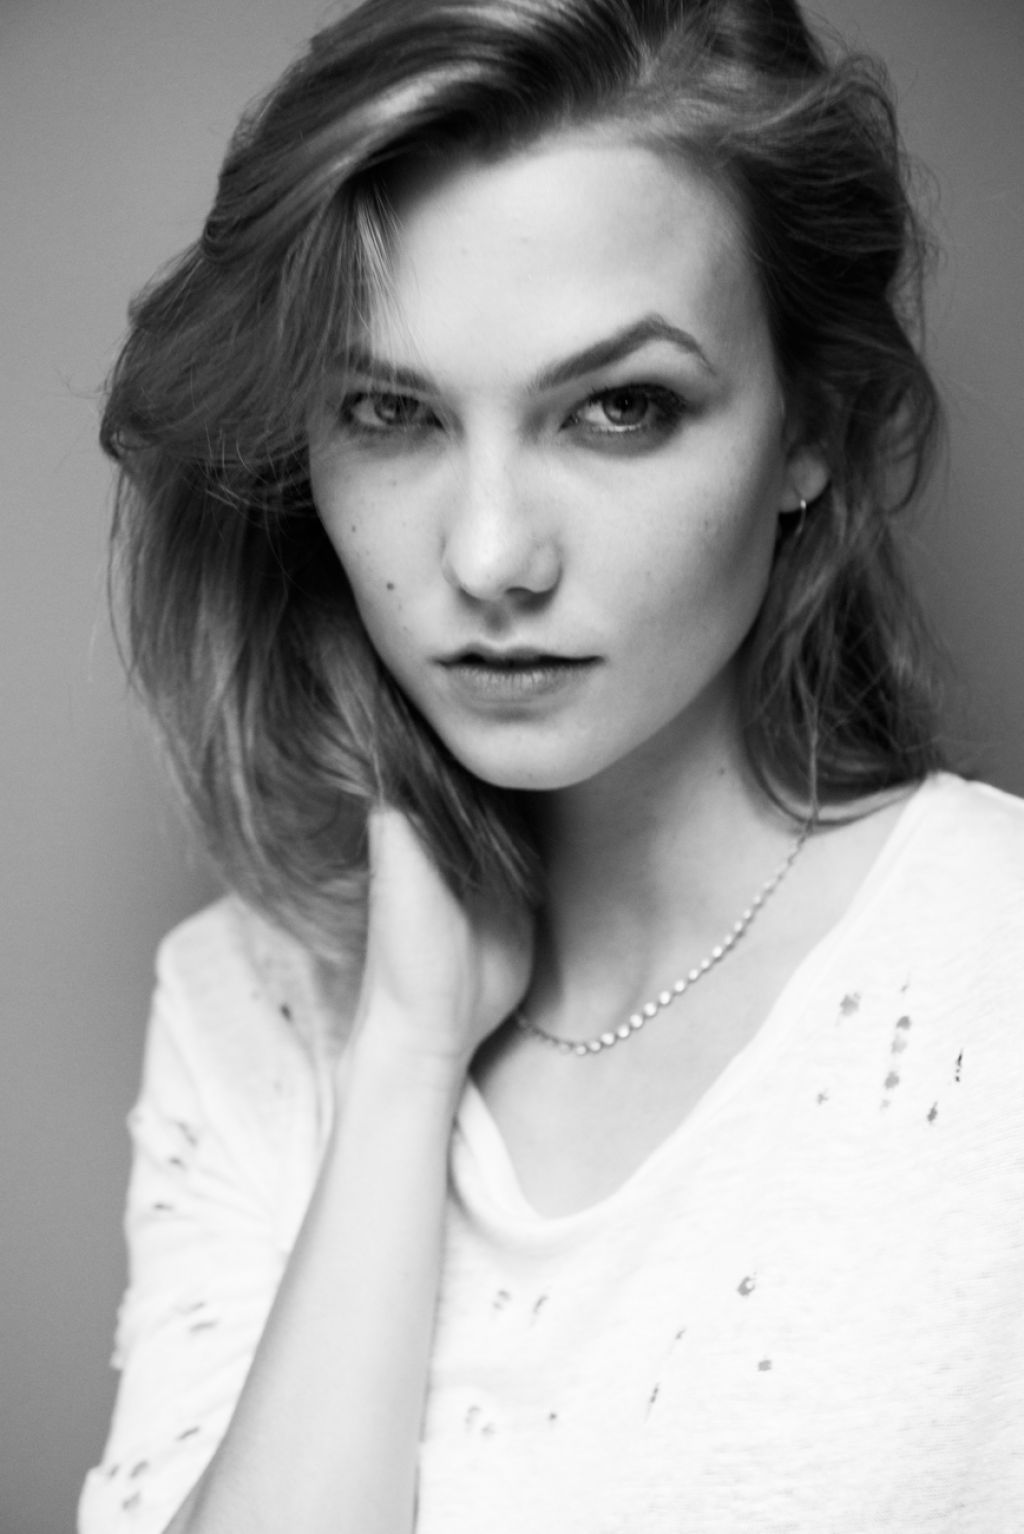 Karlie Kloss Photoshoot For The Coveteur 2014